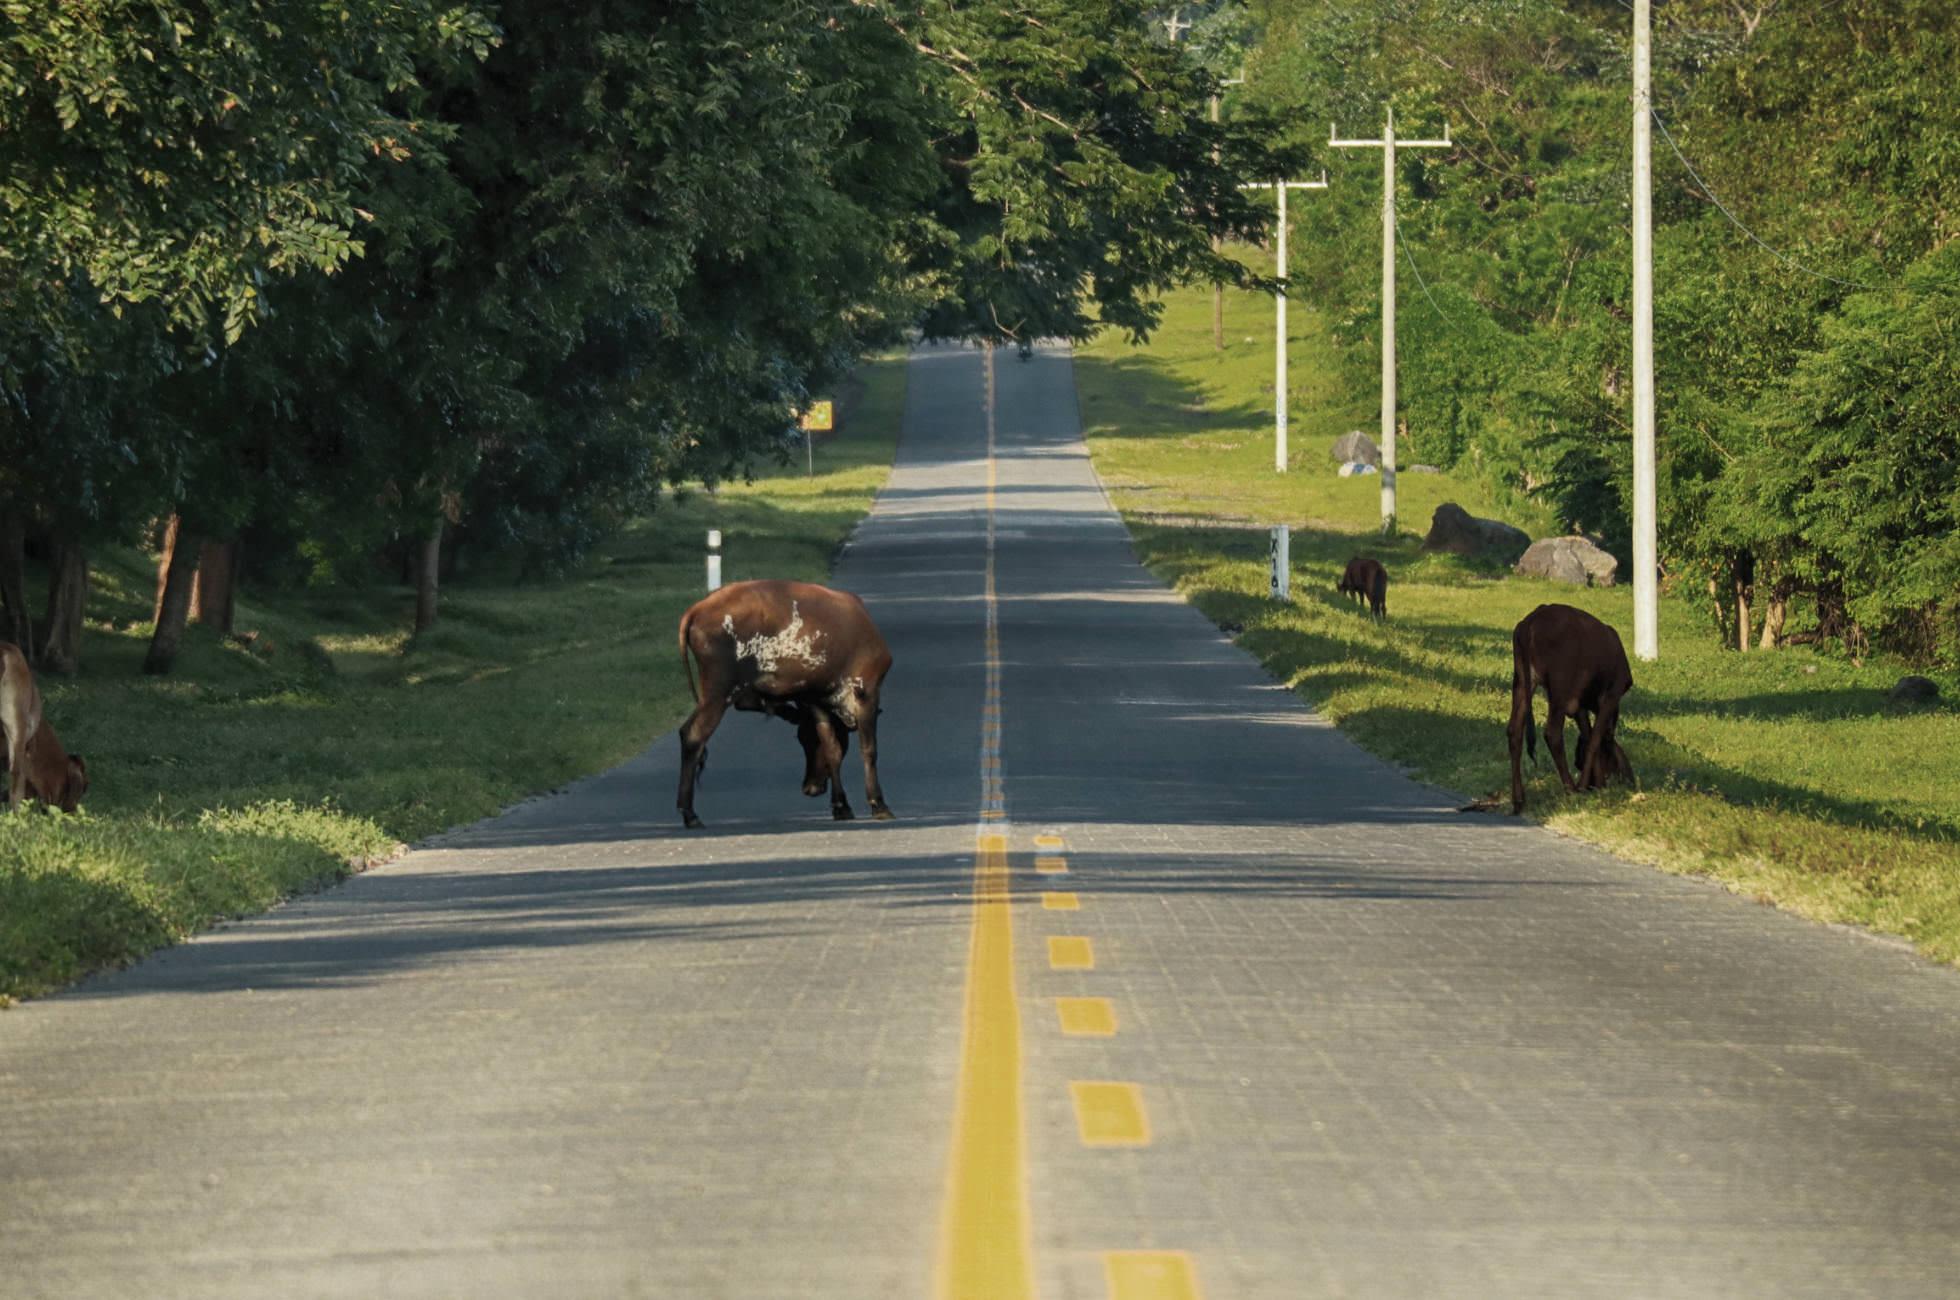 Kühe auf Straße